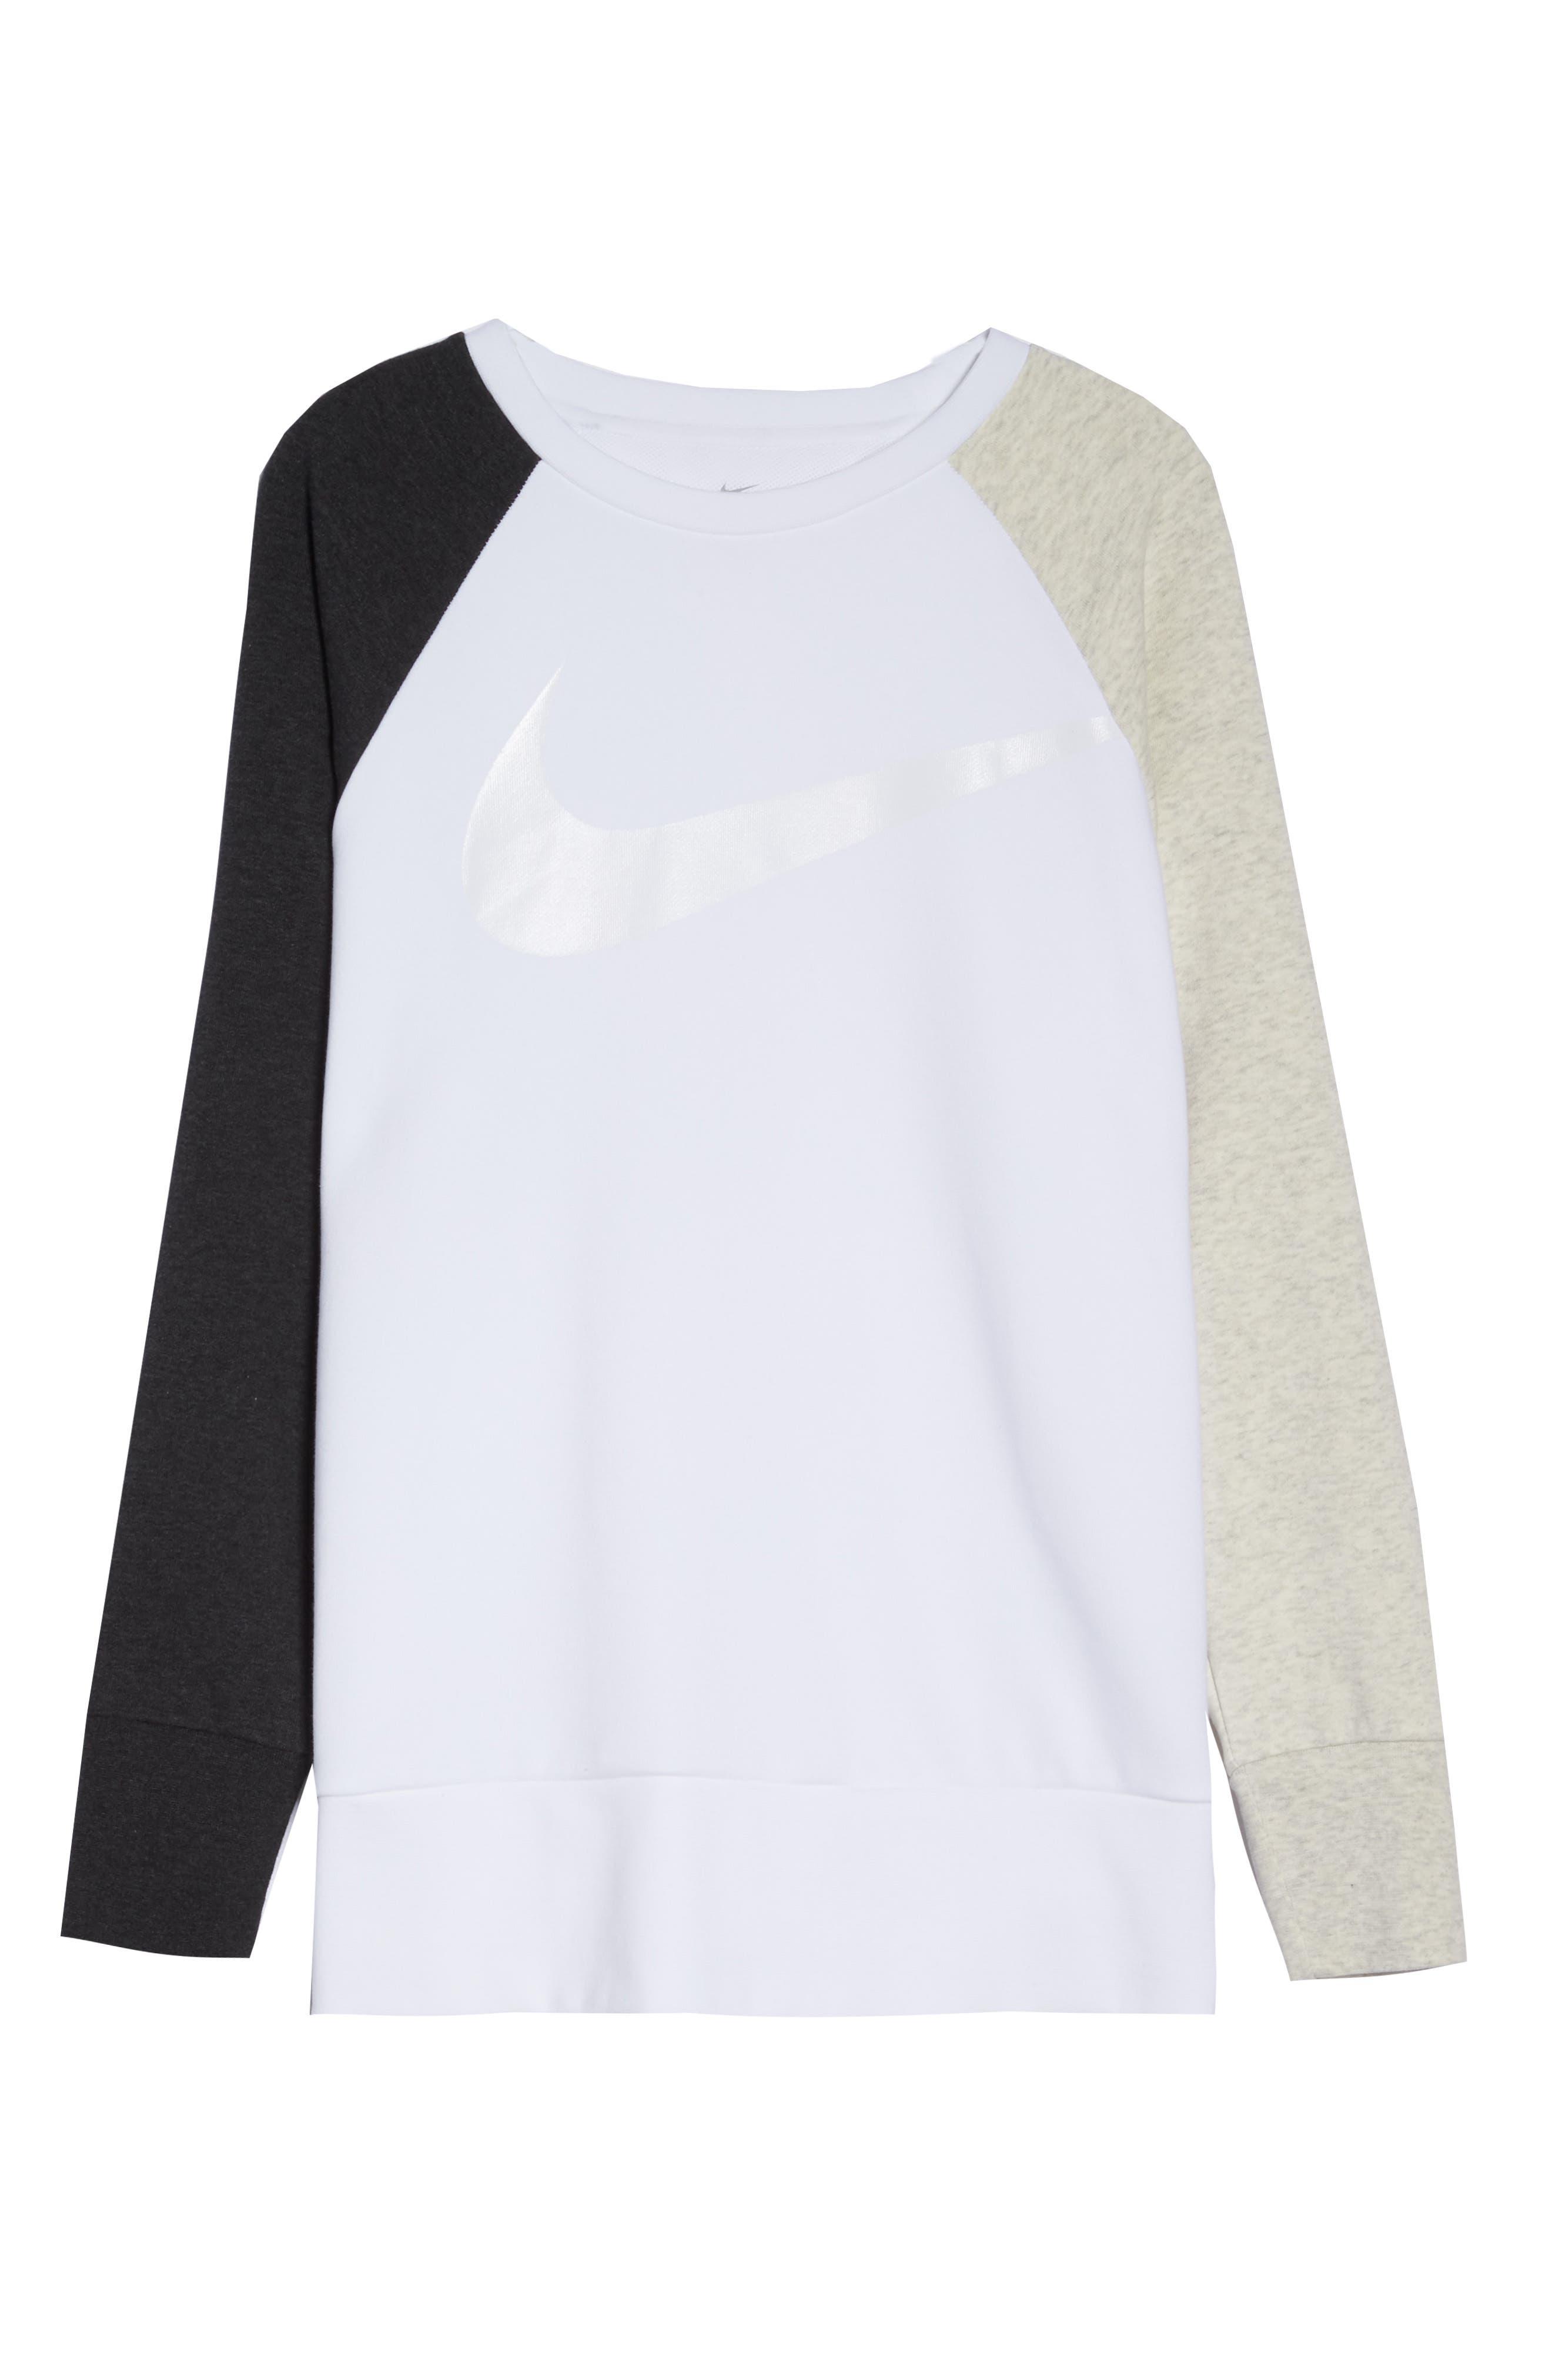 Dry Swoosh Sweatshirt,                             Alternate thumbnail 7, color,                             WHITE/ BLACK HEATHER/ WHITE